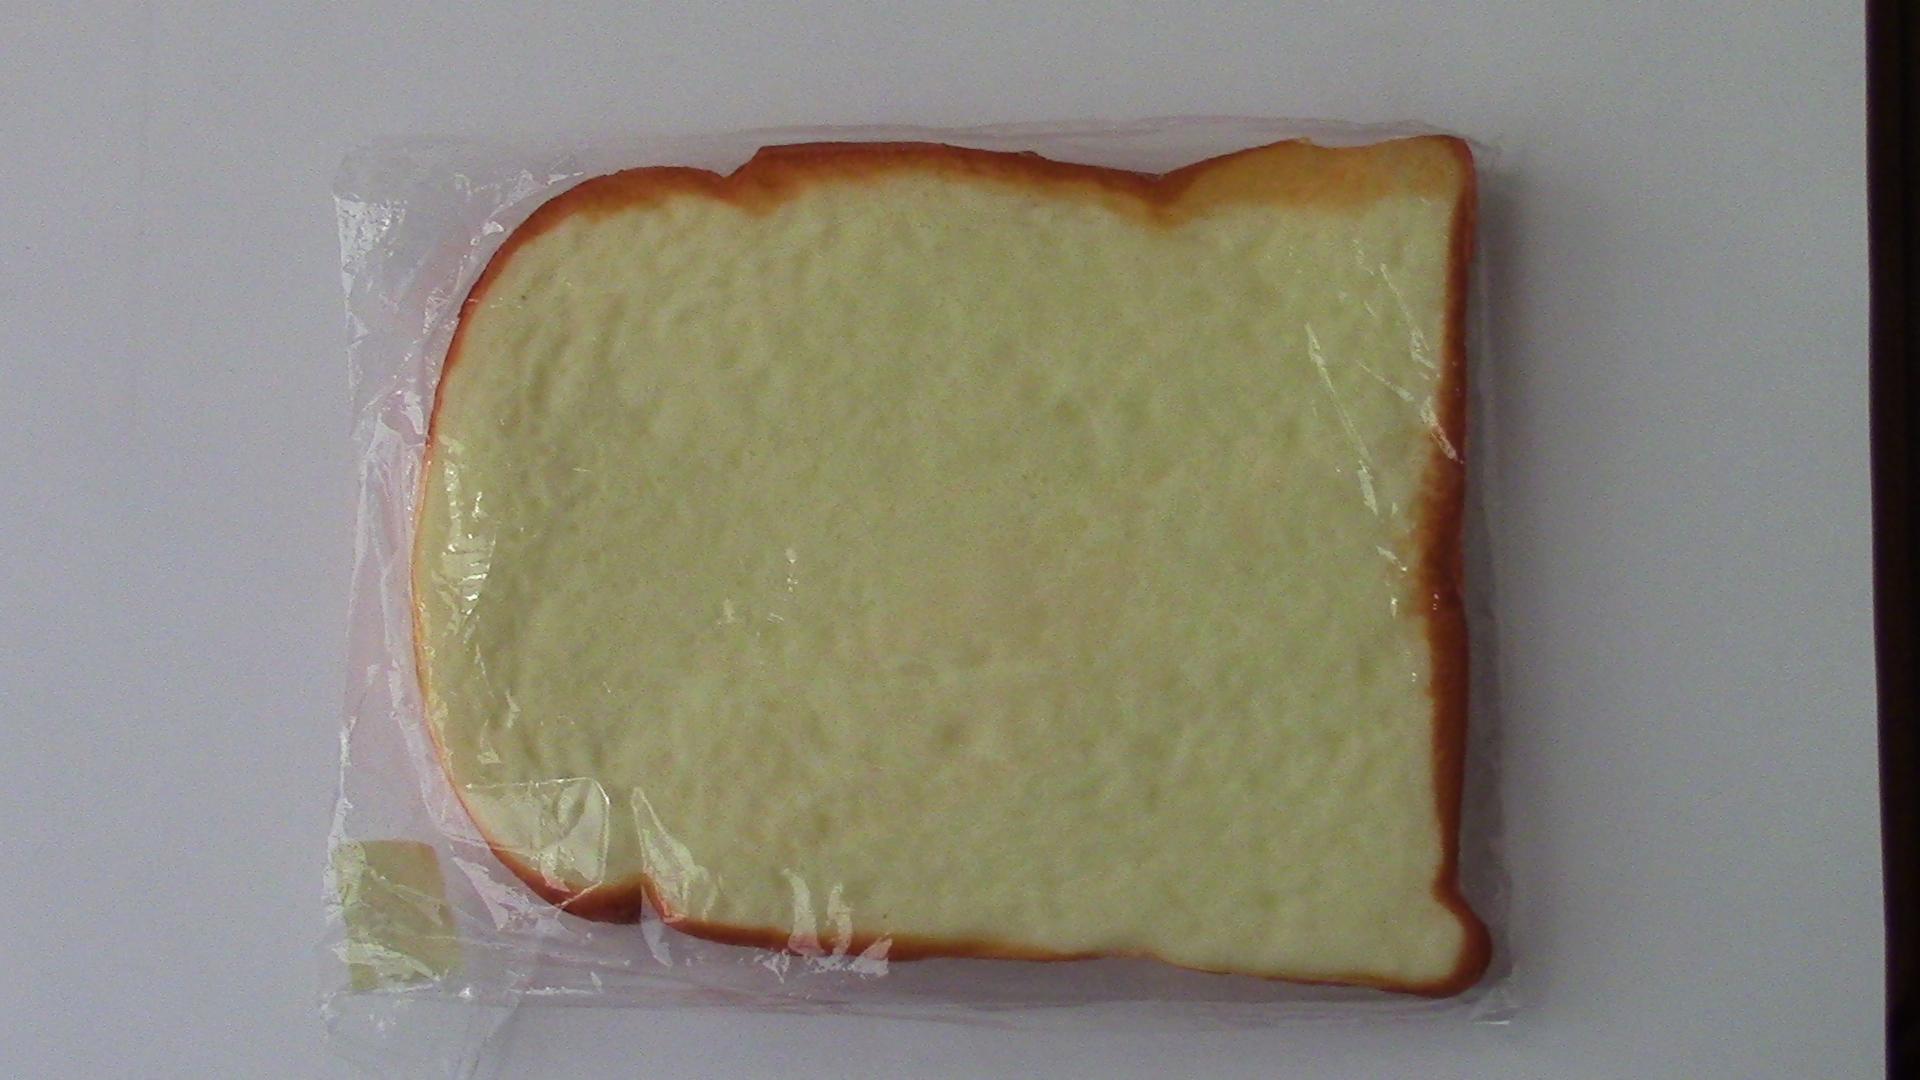 Squishy Bread Jumbo : Jumbo Bread Slice Squishy ? Kawaii Meg ? Online Store Powered by Storenvy